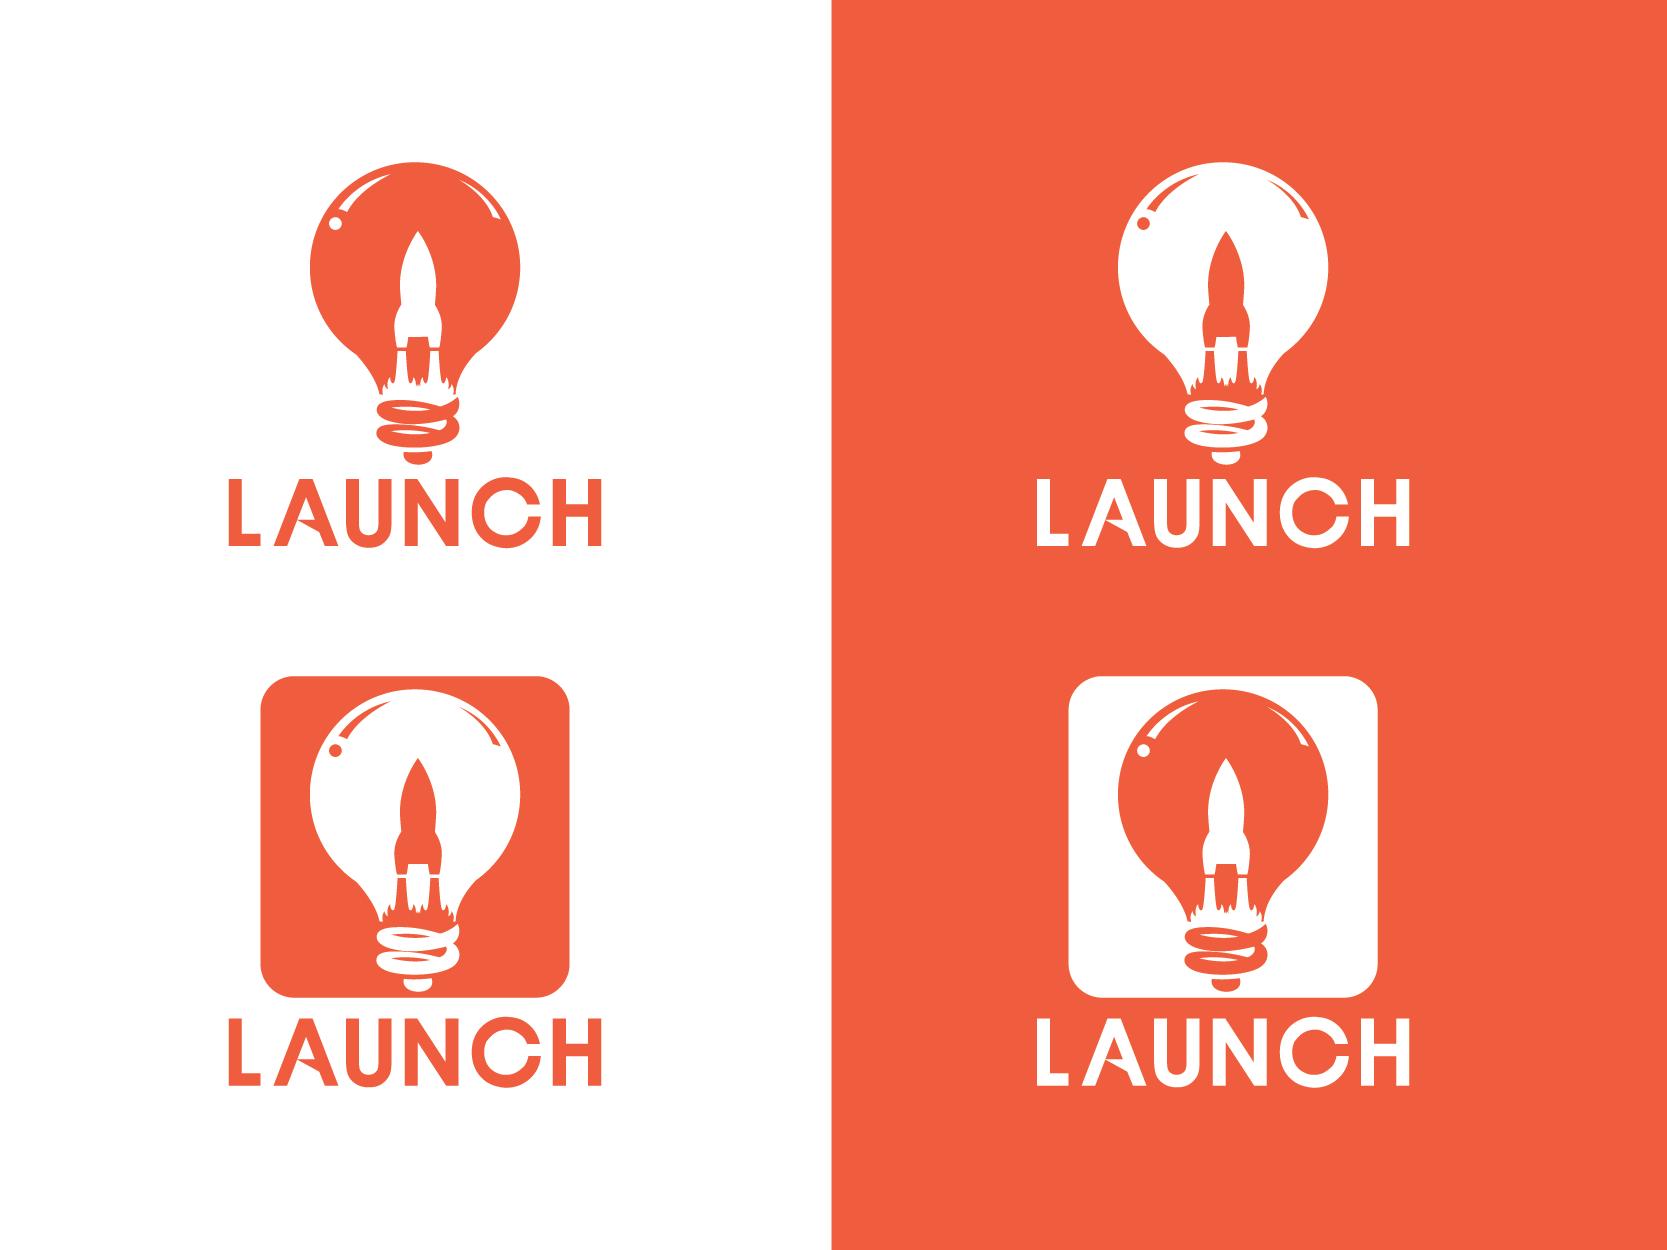 LAUNCH Entrepreneurship Program needs a logo